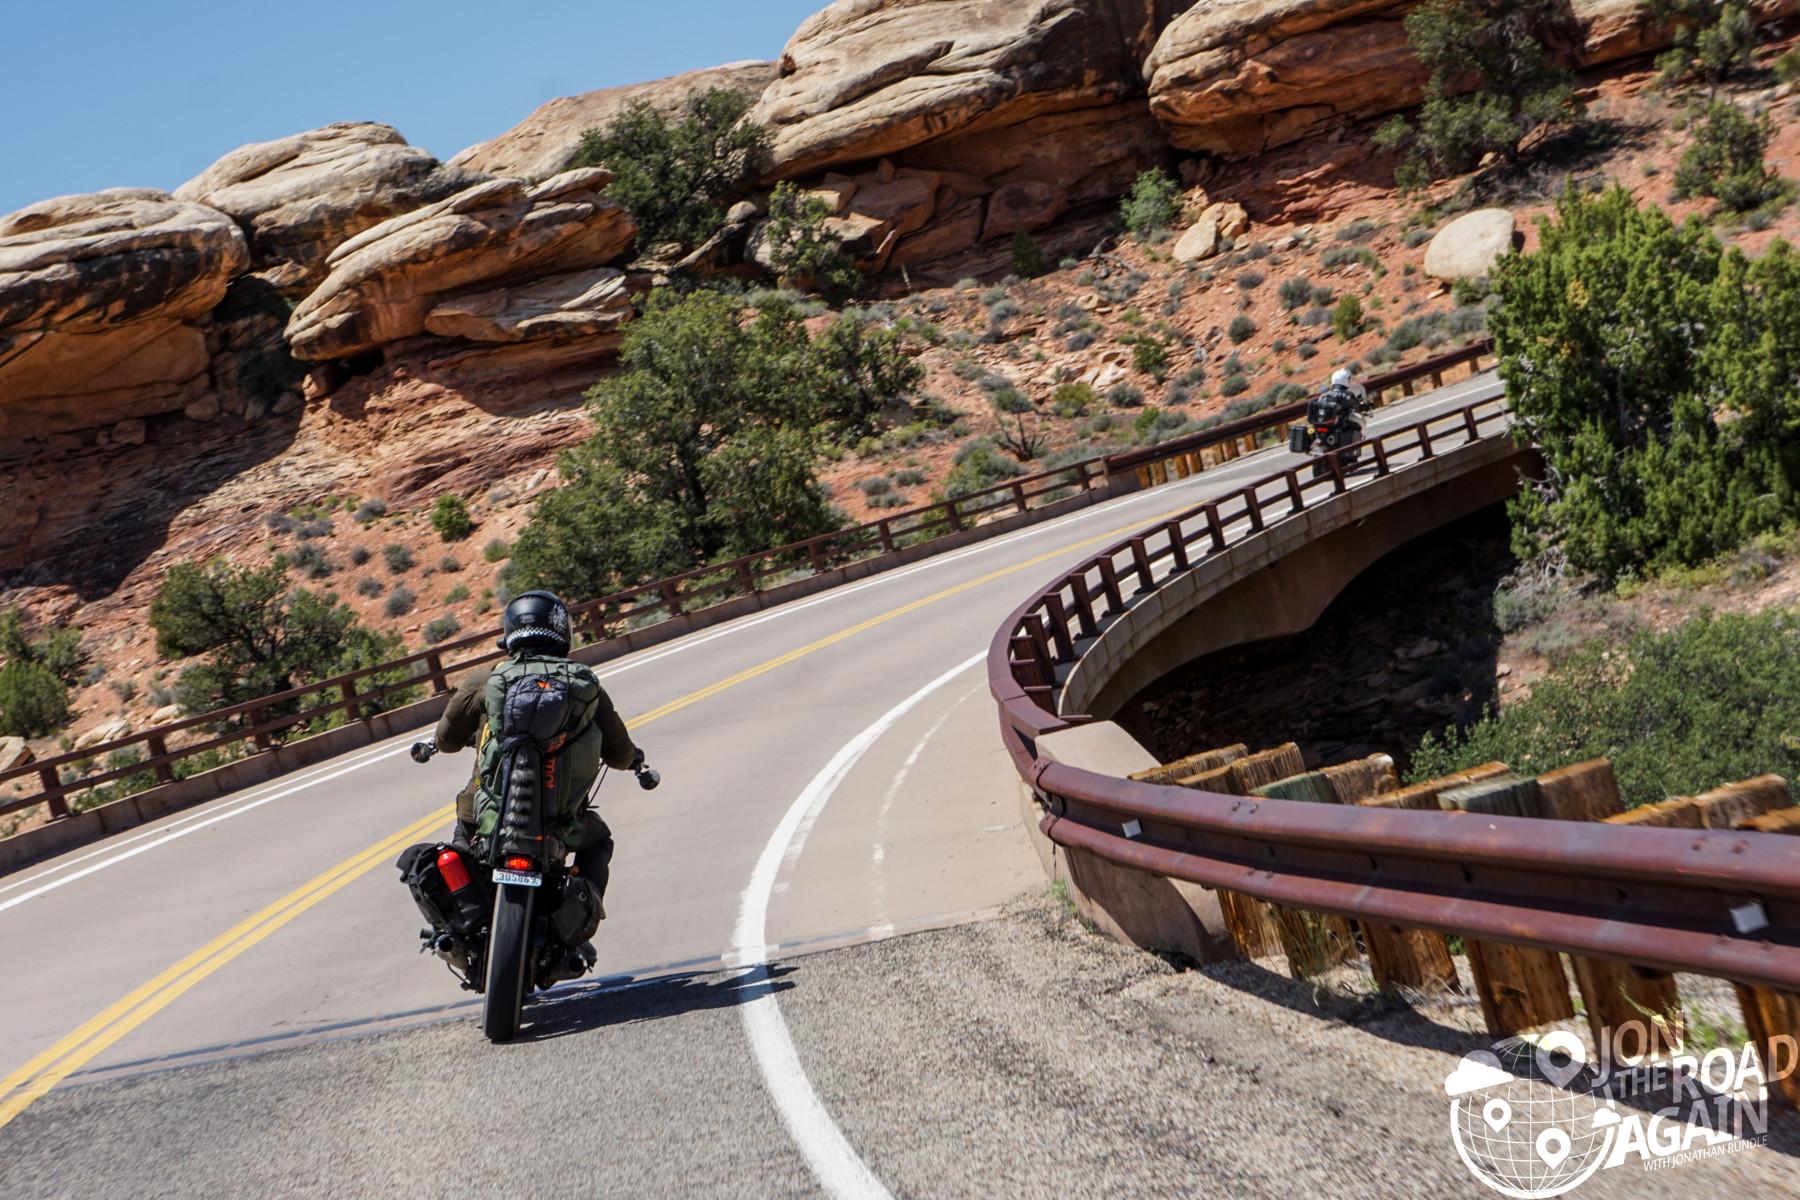 Riding through canyonlands